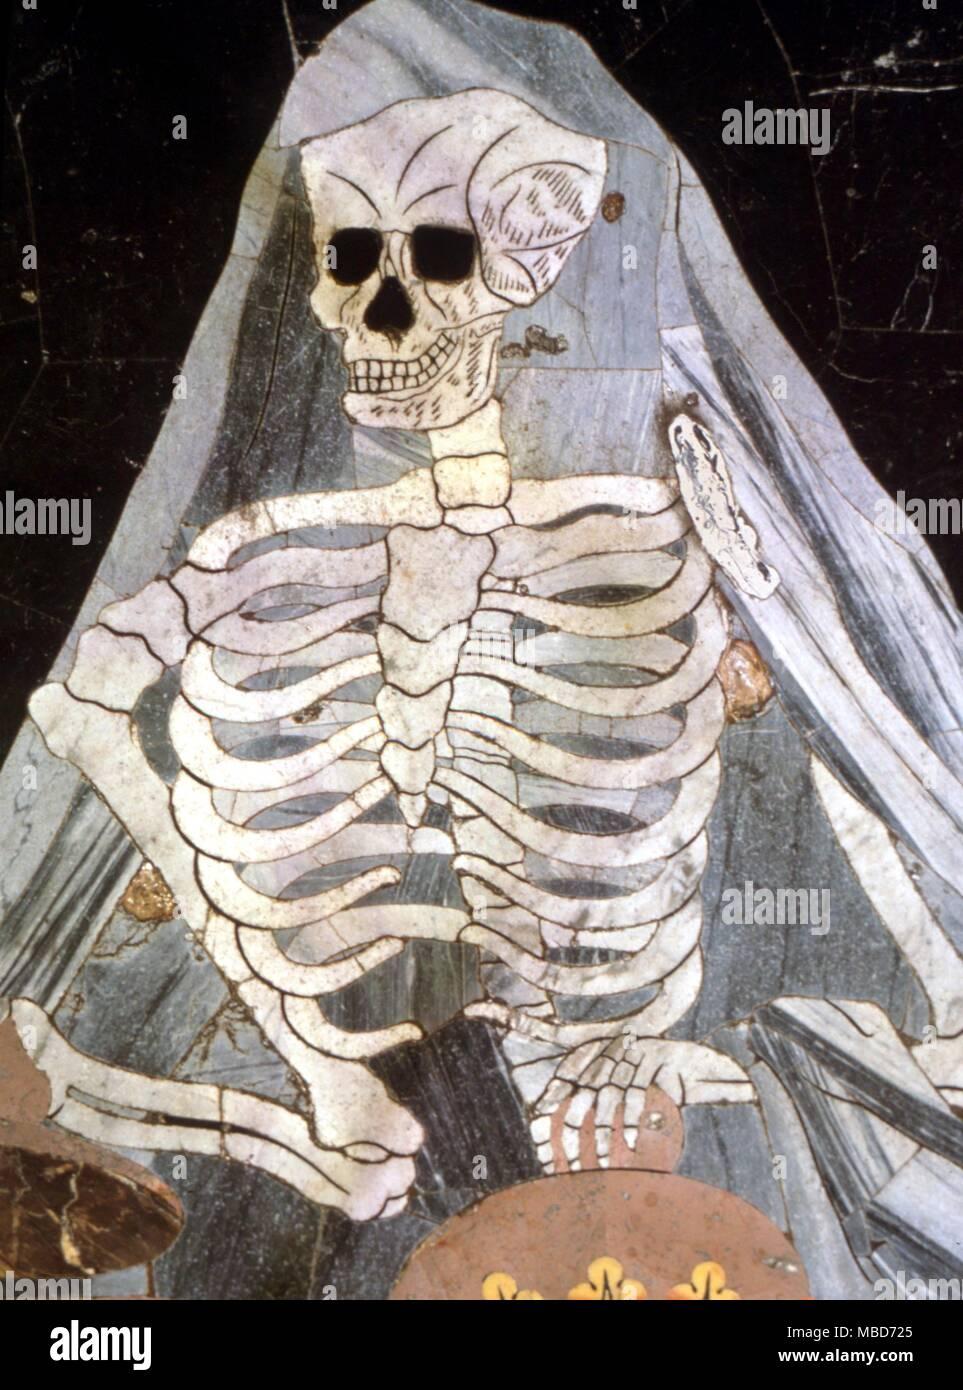 Muerte - esqueleto en mármol , desde el magnífico pavimento de mármol de la Catedral de St John, Valetta, Malta - Siglo XVIII Imagen De Stock